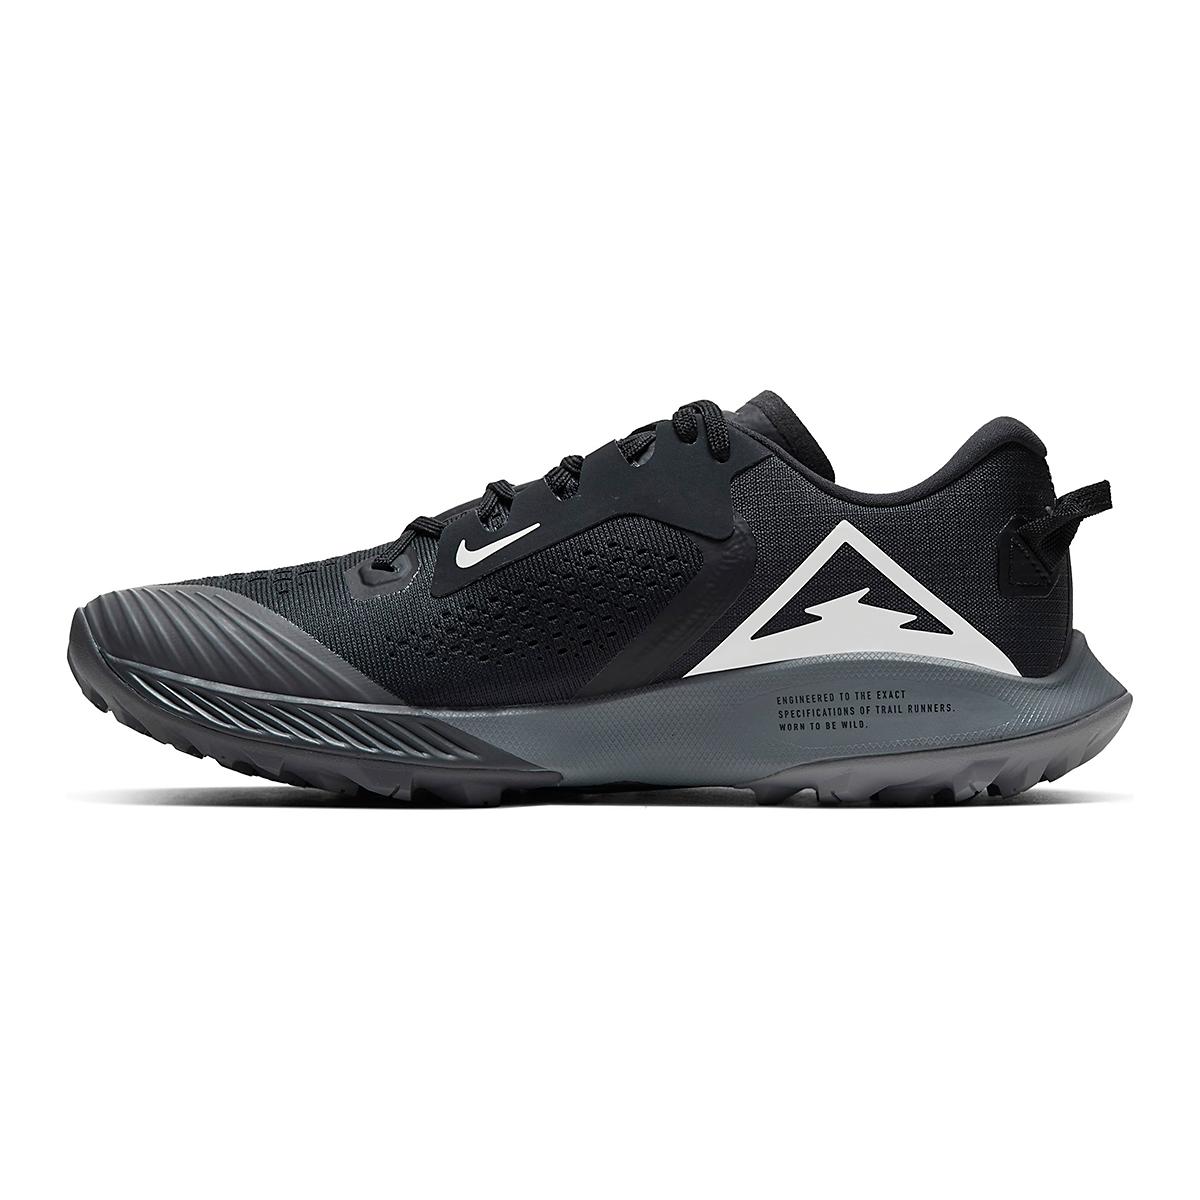 Women's Nike Air Zoom Terra Kiger 6 Trail Running Shoe - Color: Off Noir/Black/Iron Grey/Spruce Aura - Size: 5 - Width: Regular, Off Noir/Black/Iron Grey/Spruce Aura, large, image 4